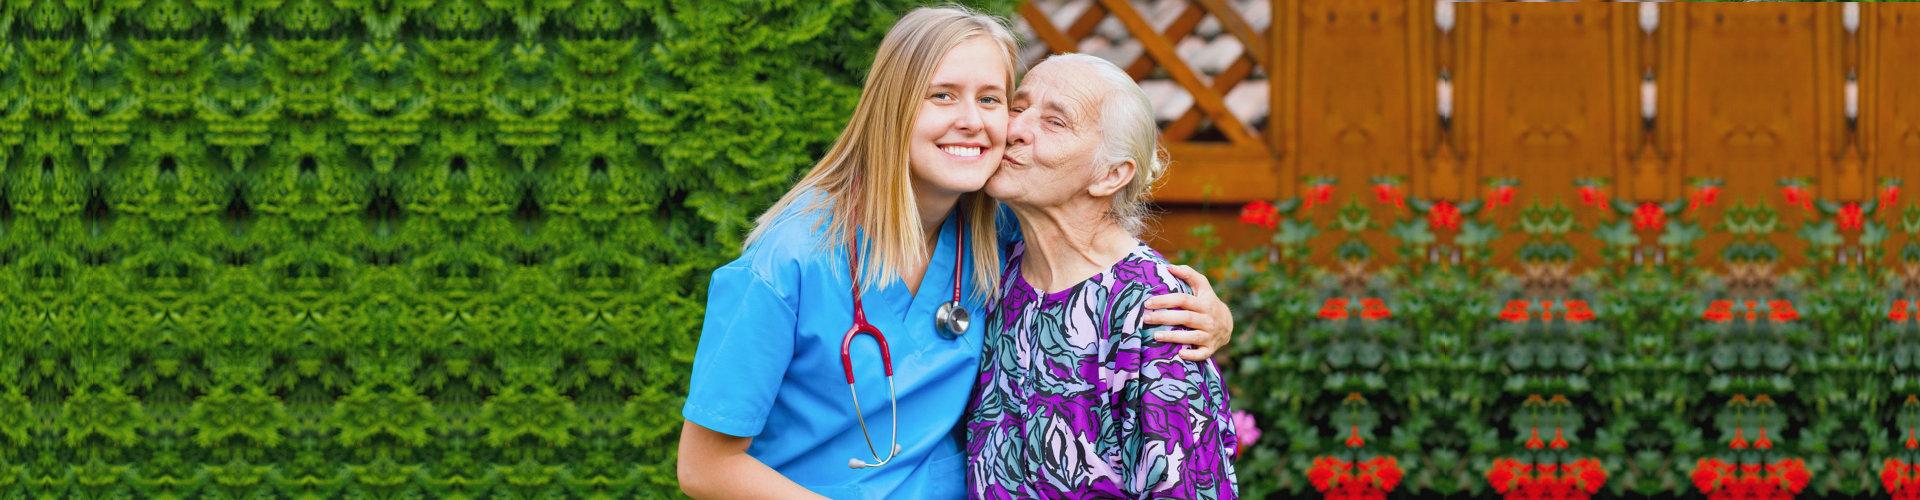 senior woman kissing her personal nurse